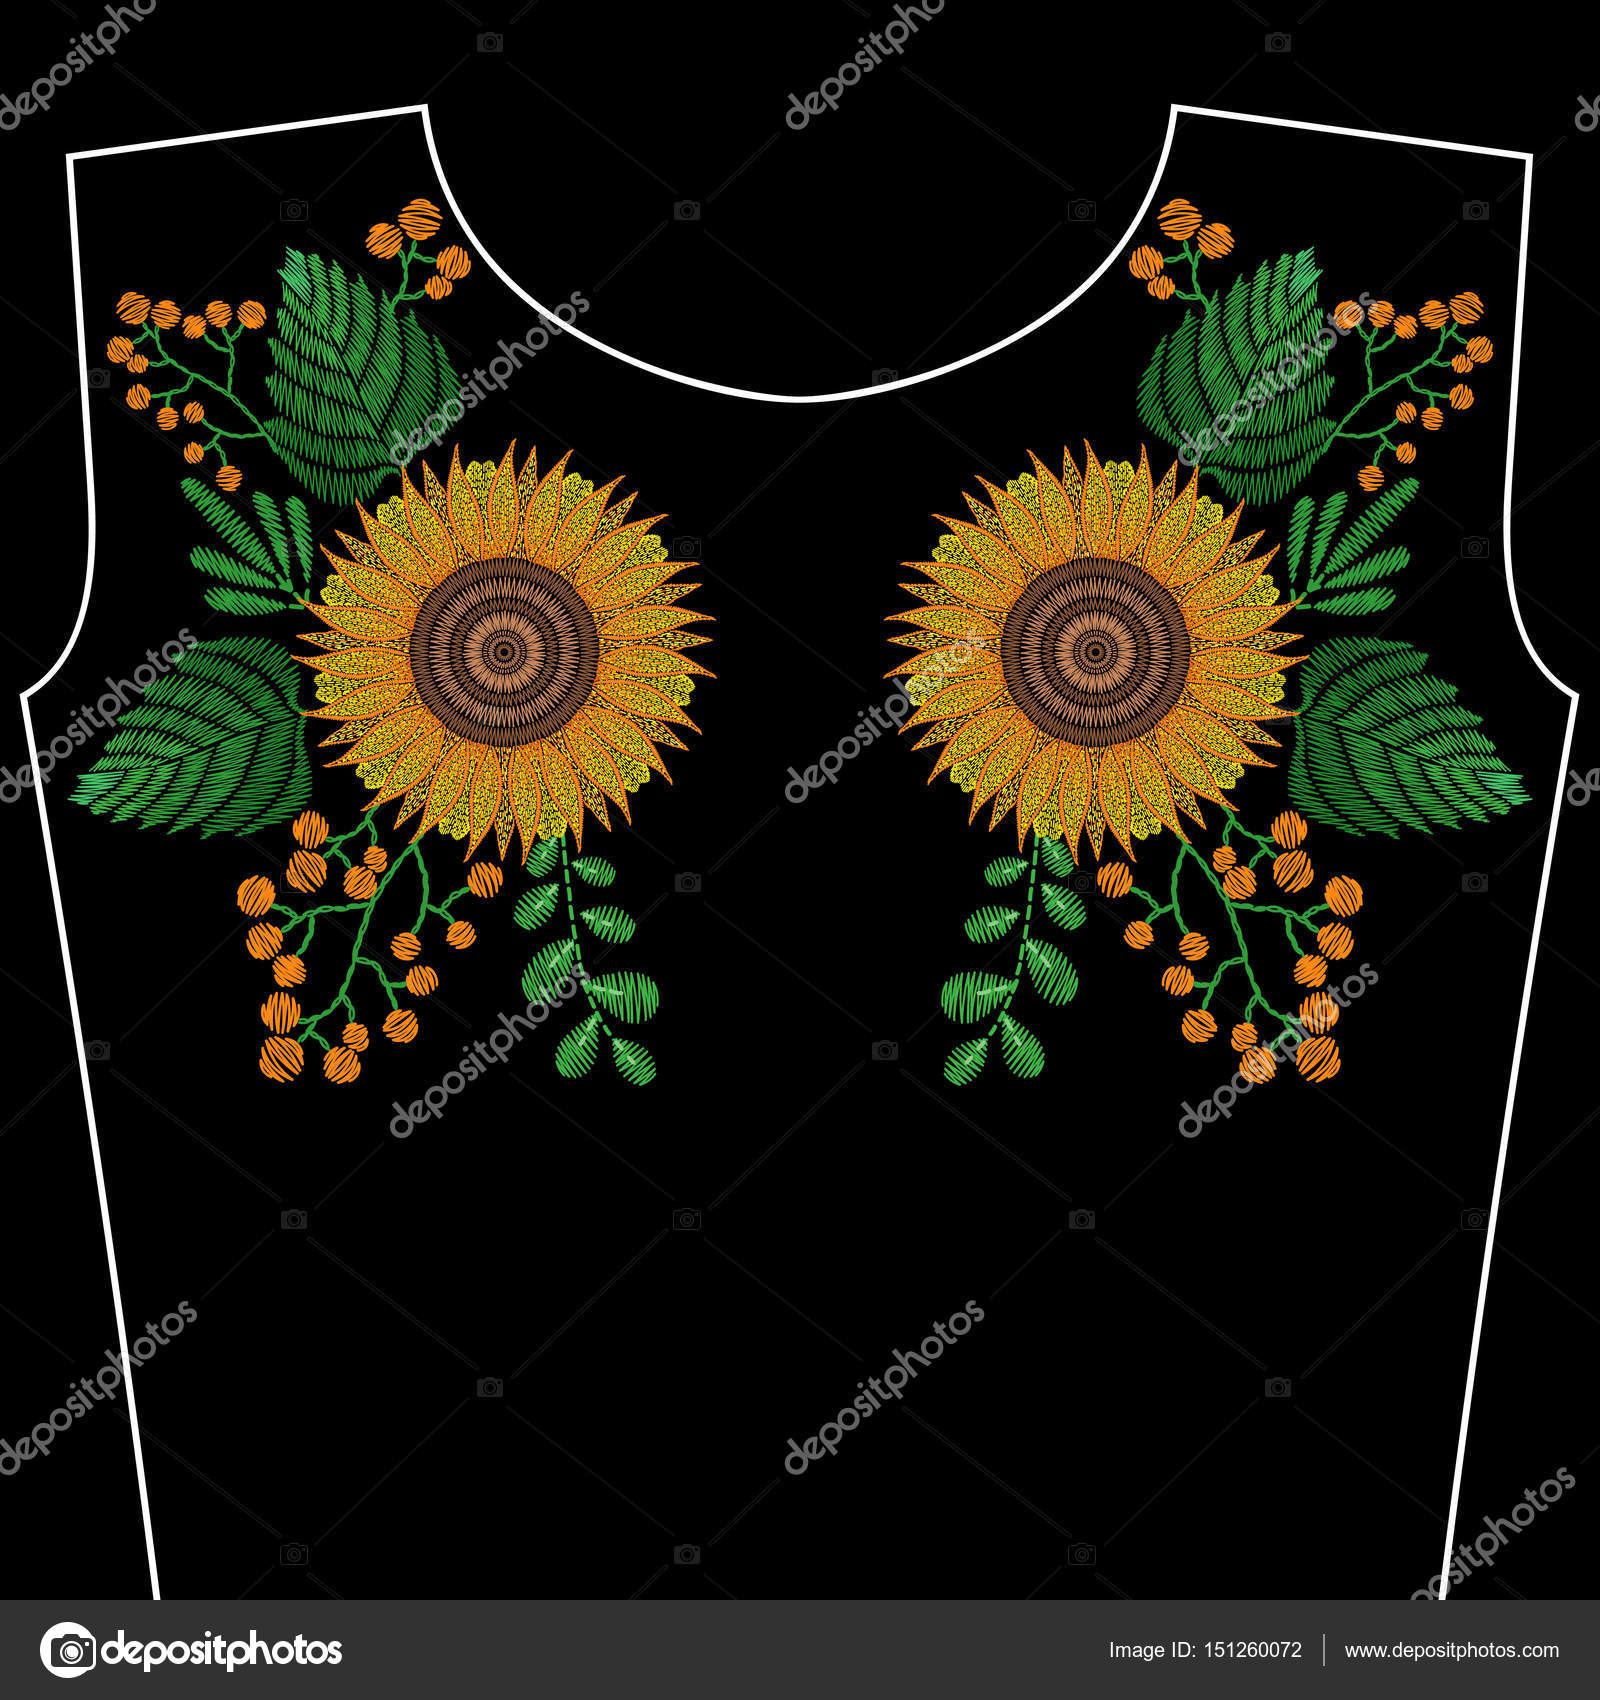 Imagenes Girasol Para Bordar Puntadas De Bordado Con Flores De